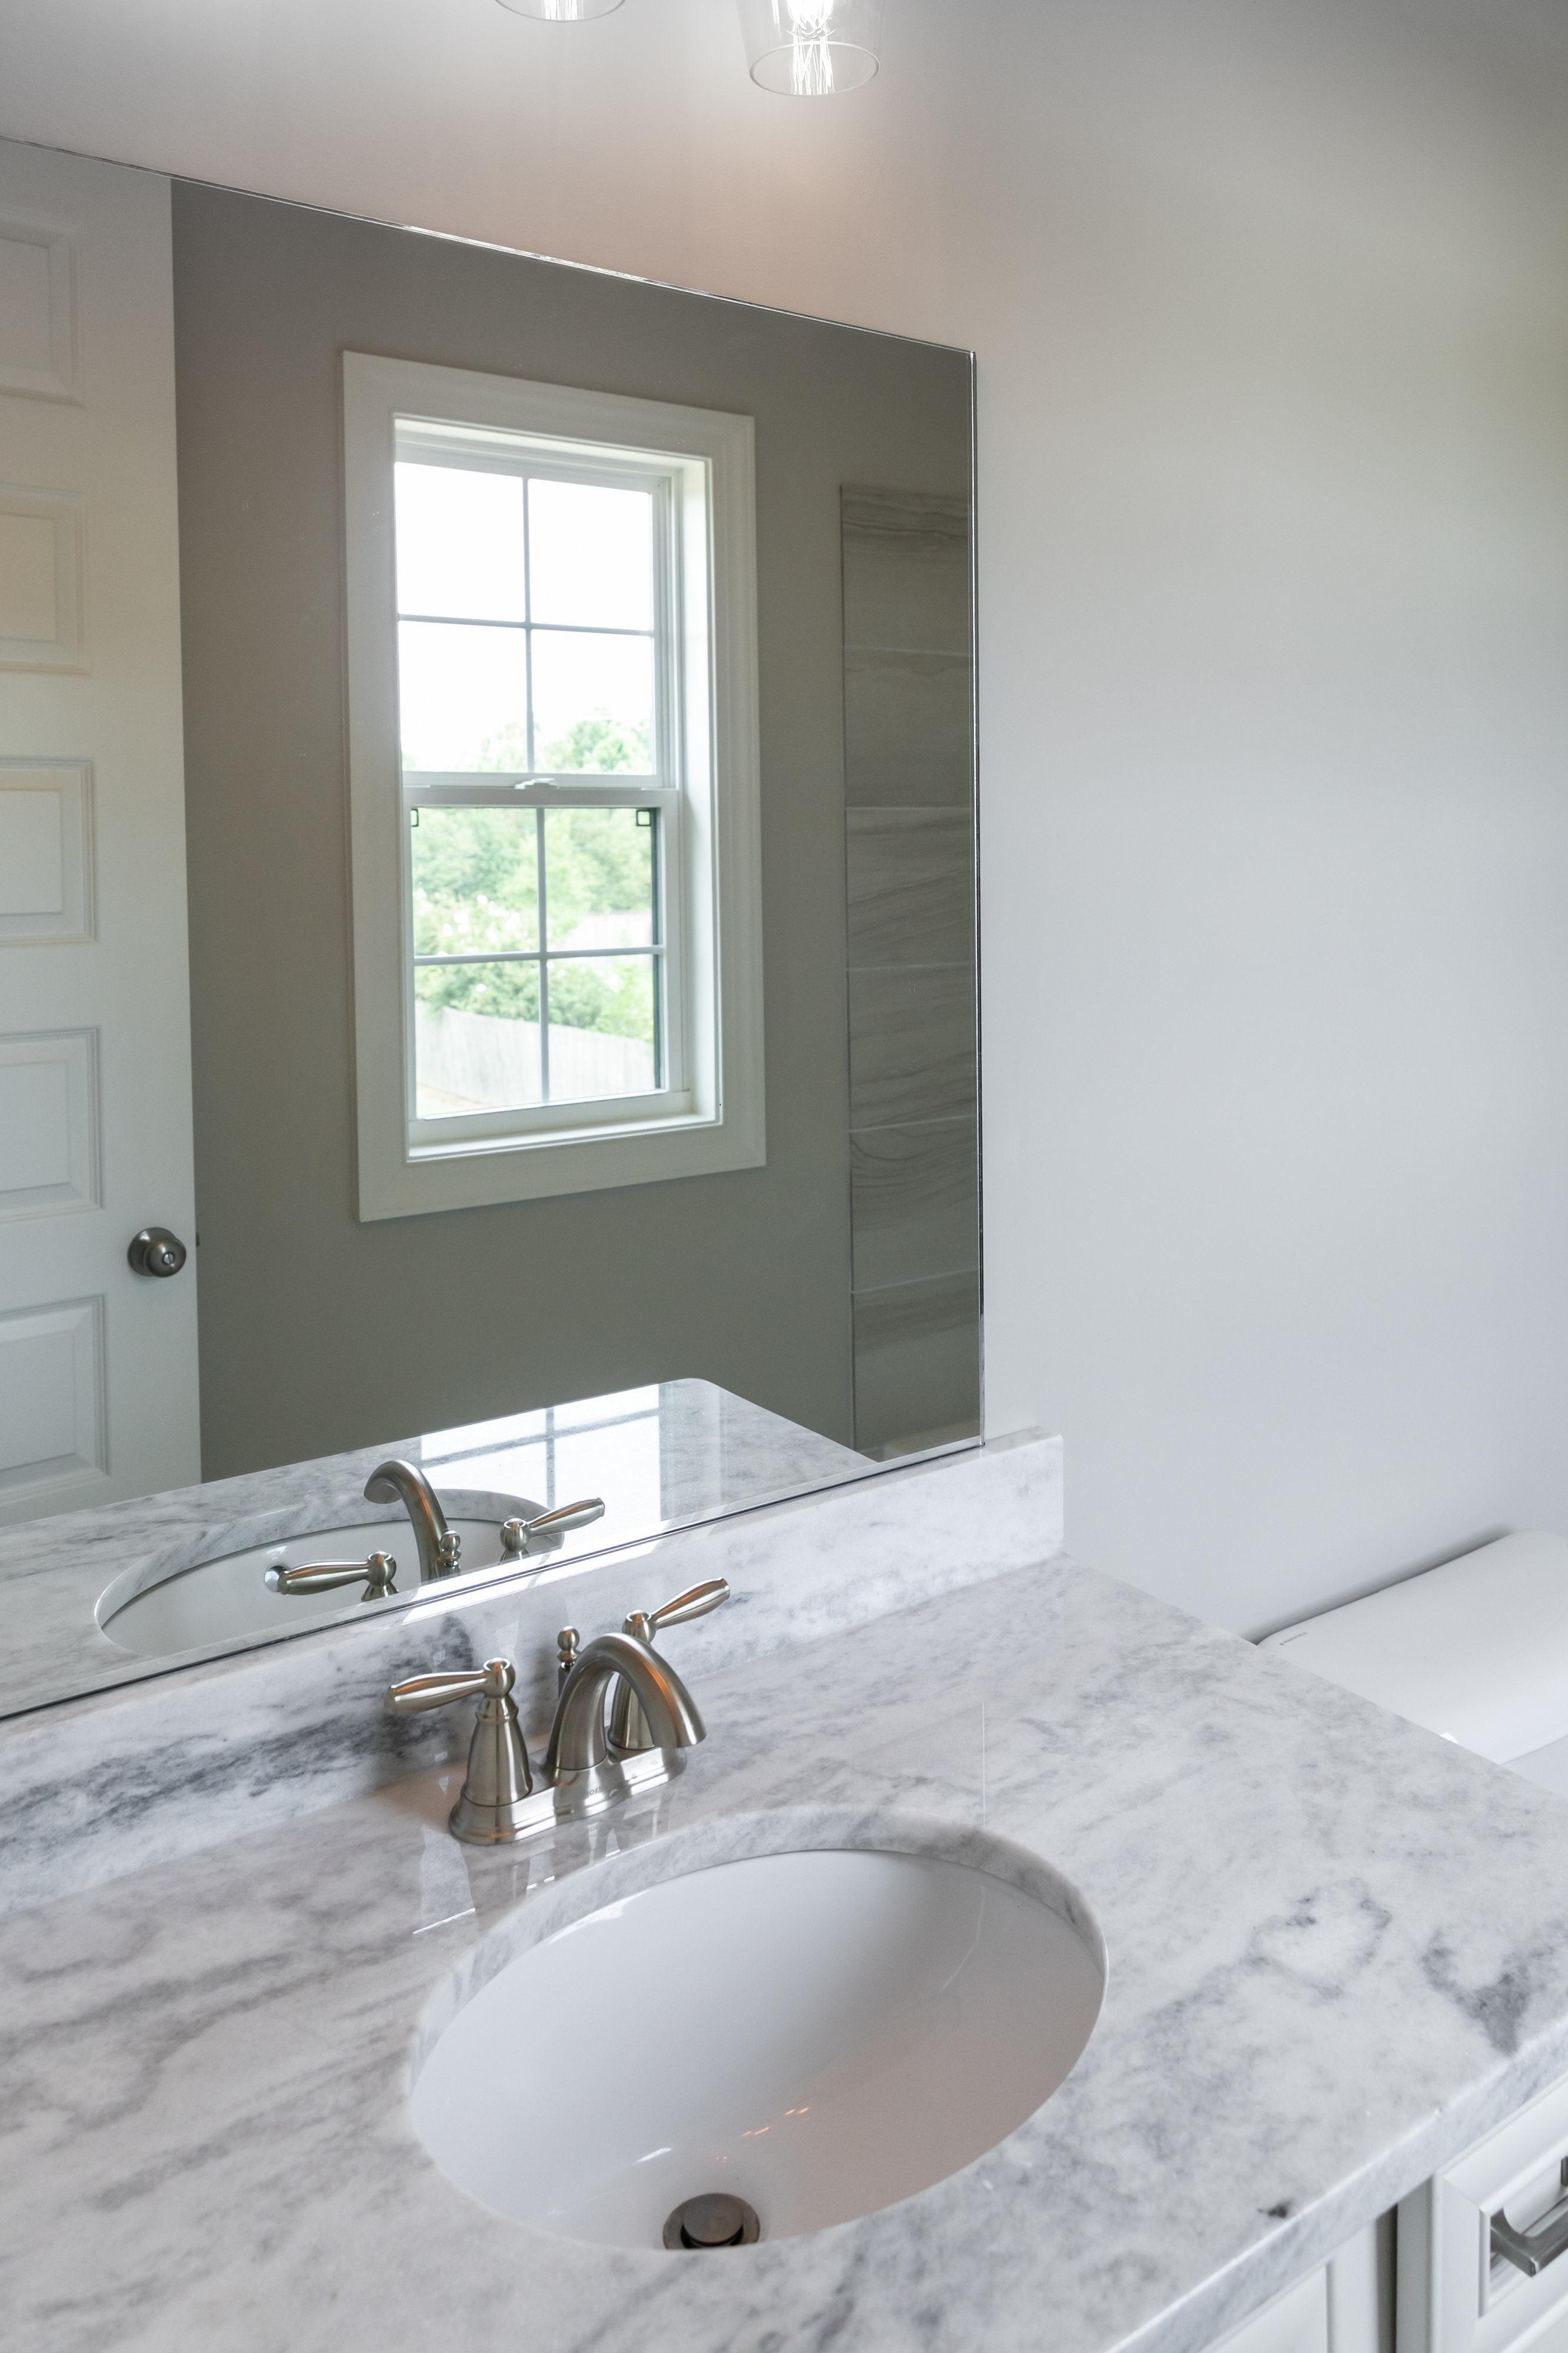 Bathroom featured in the Cooper By Regency Homebuilders in Memphis, TN